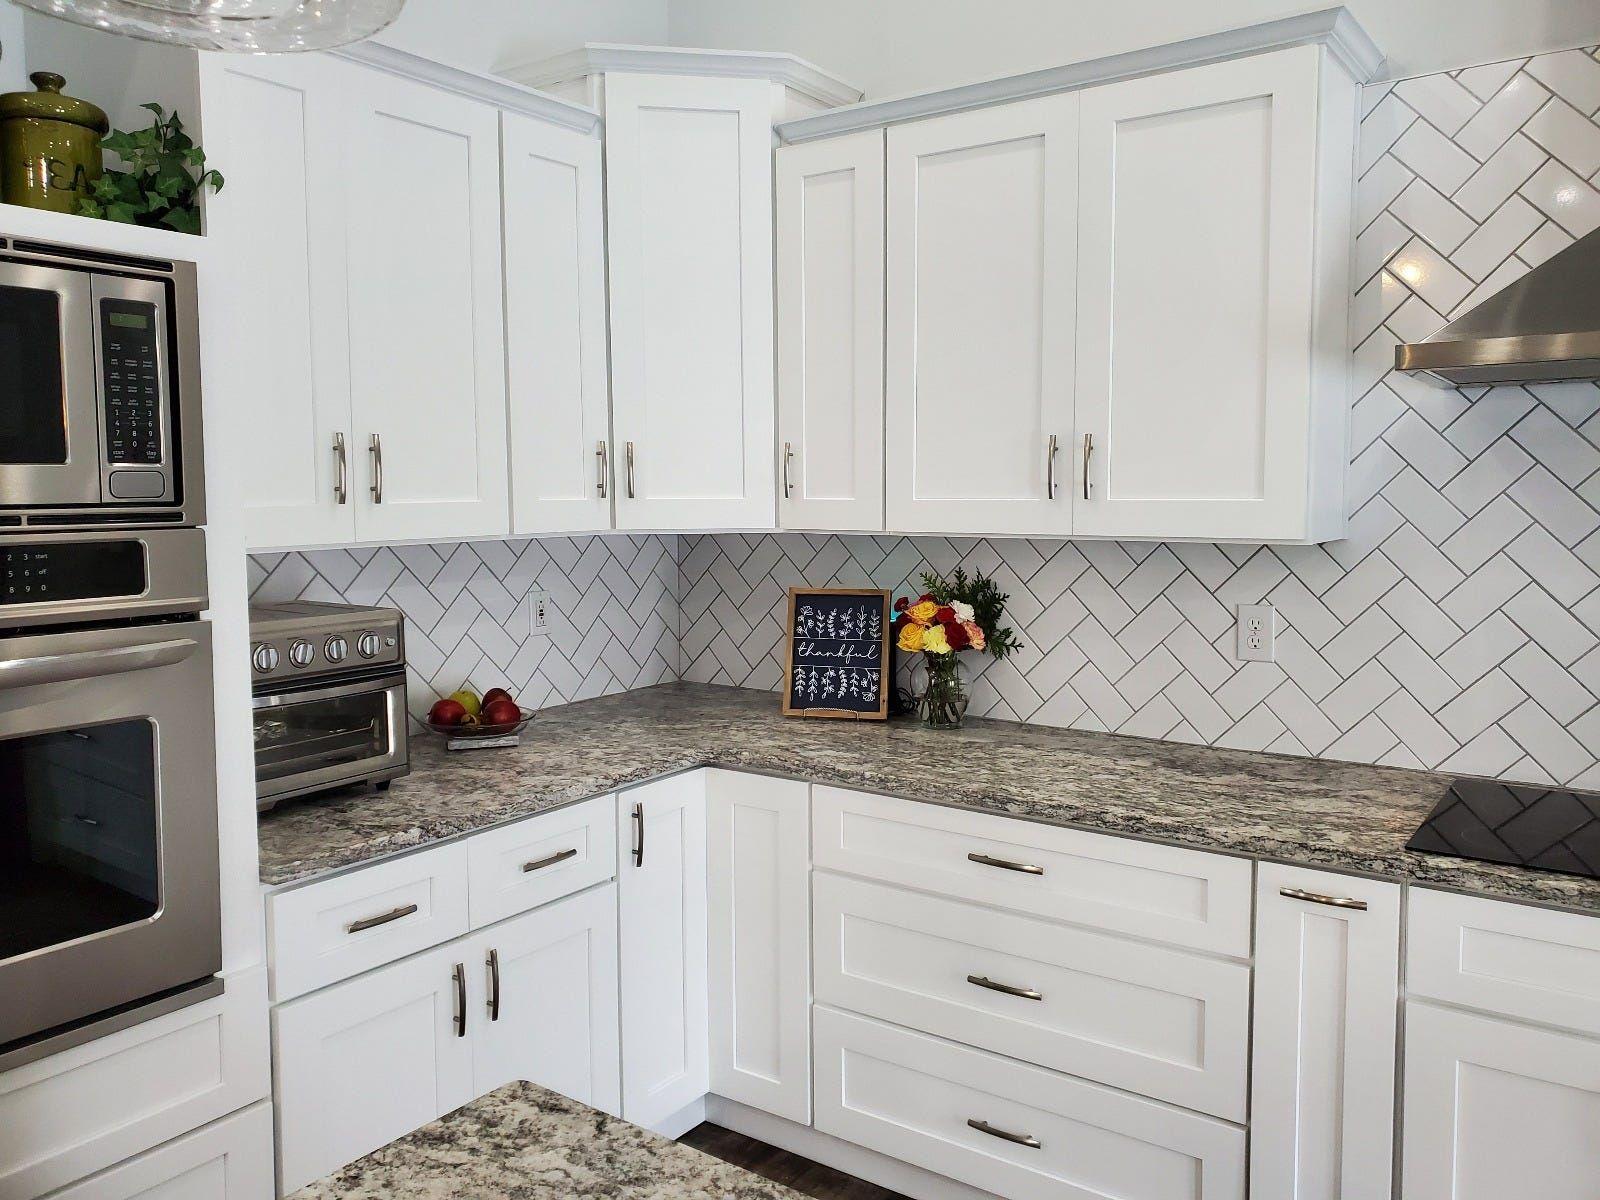 Should I Paint My Kitchen Cabinets Pros Vs Cons In 2020 Kitchen Cabinets Redo Kitchen Cabinets Painting Kitchen Cabinets